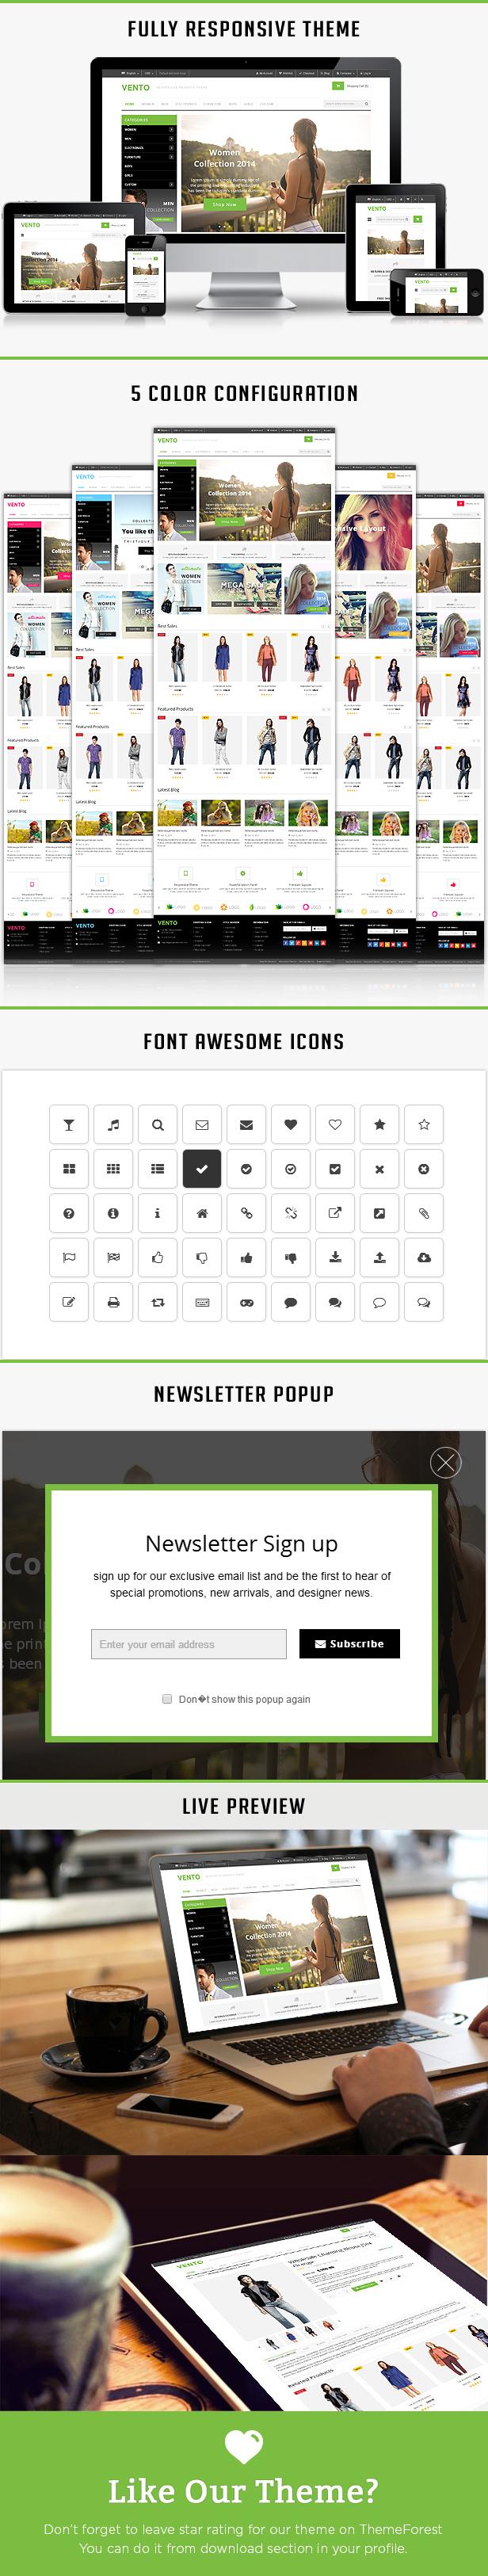 vento responsive html template